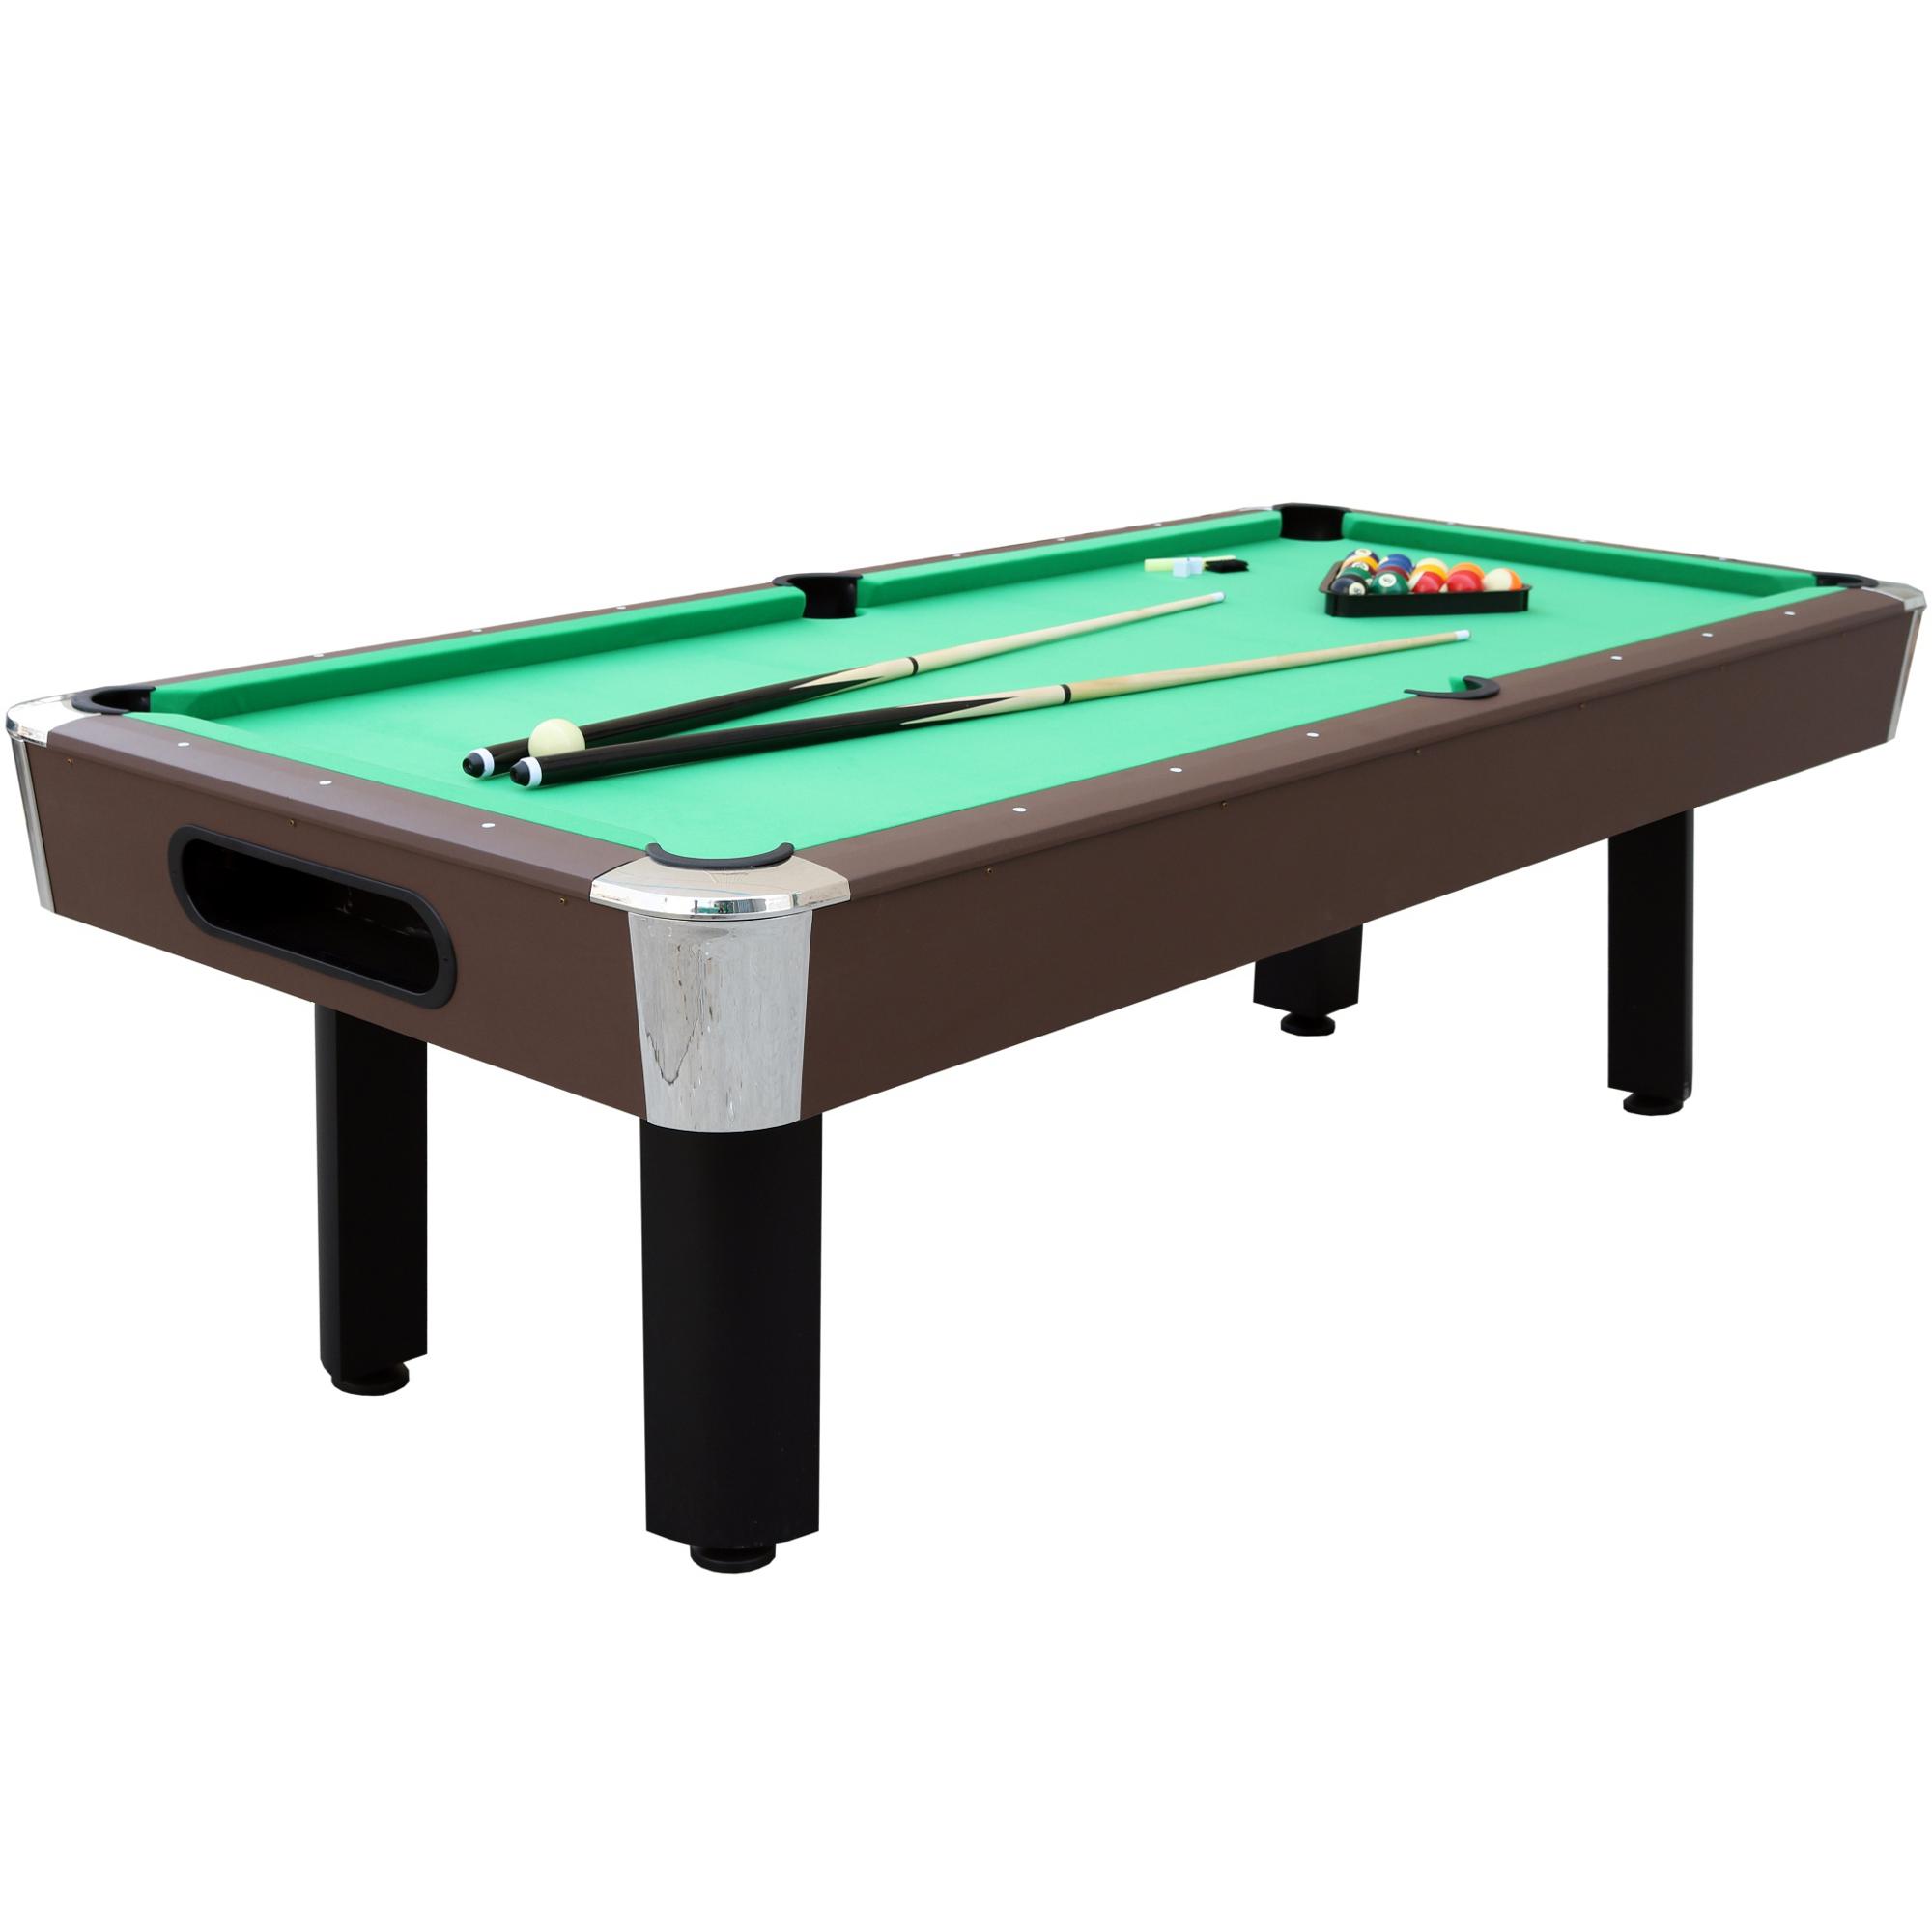 Mizerak | Mizerak Pool Table Reviews | Mizerak Pool Table